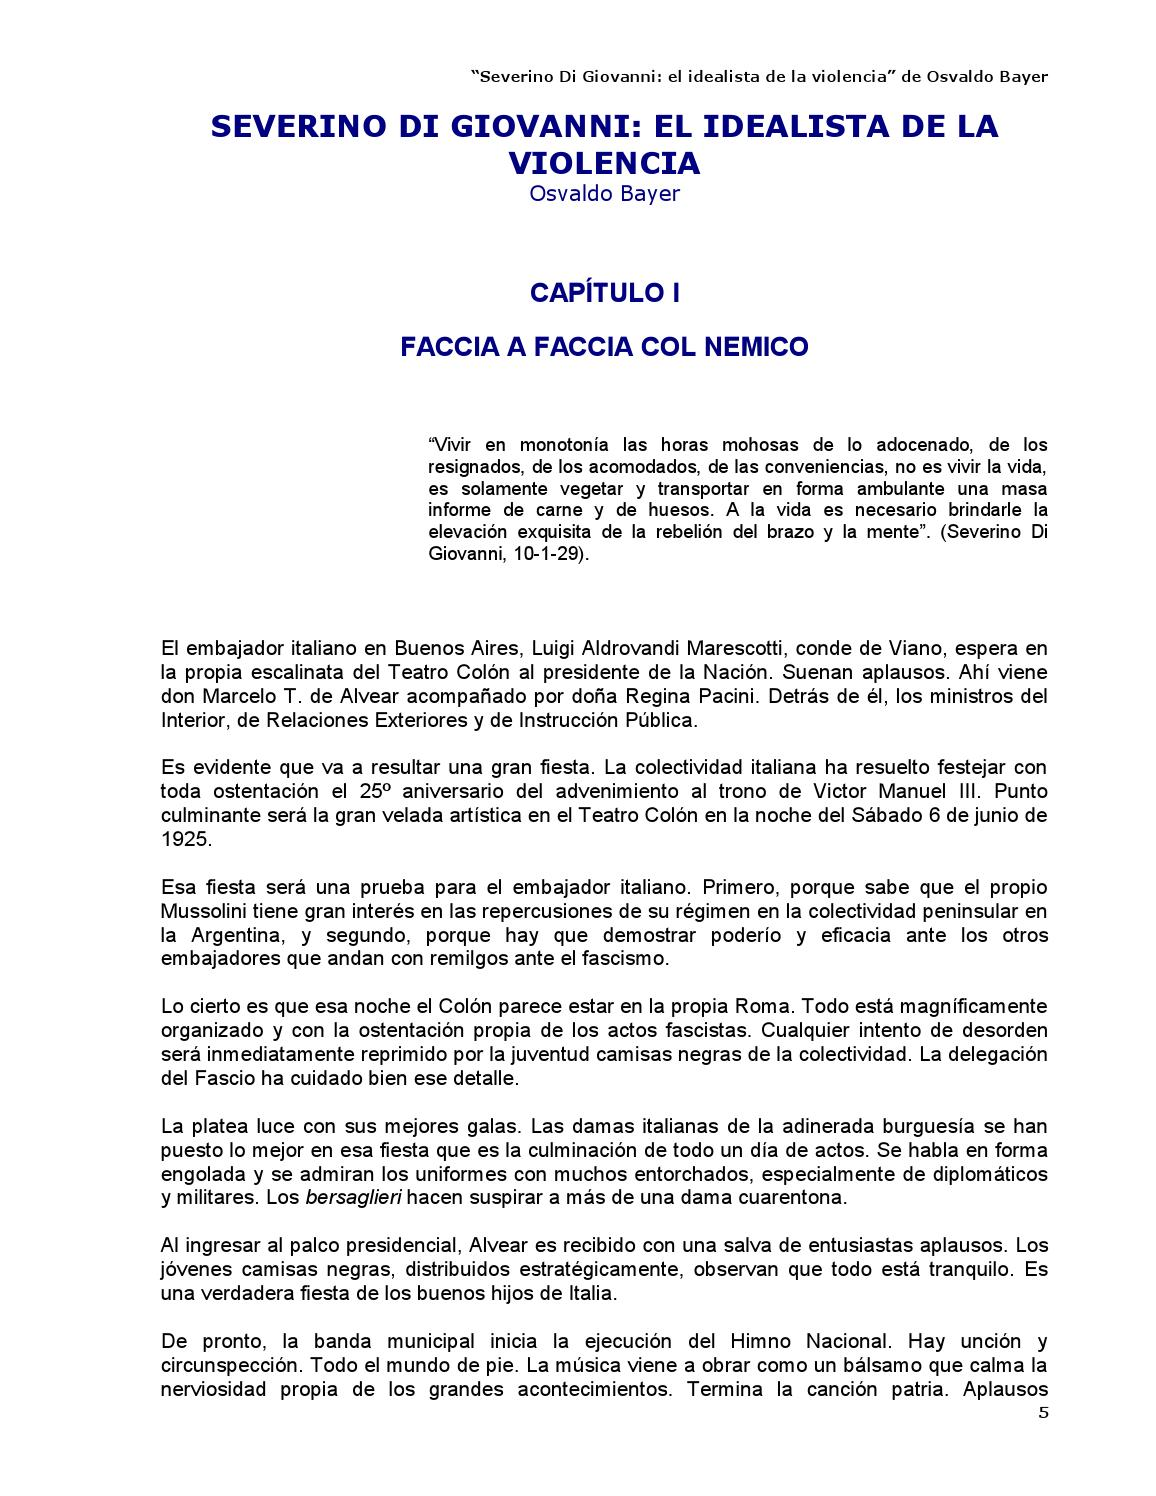 FIAT 500 F//L//R LINERS ASIENTO COMPLETO TAPICERÍA ASIENTOS NEGRO A CAÍN COSTA